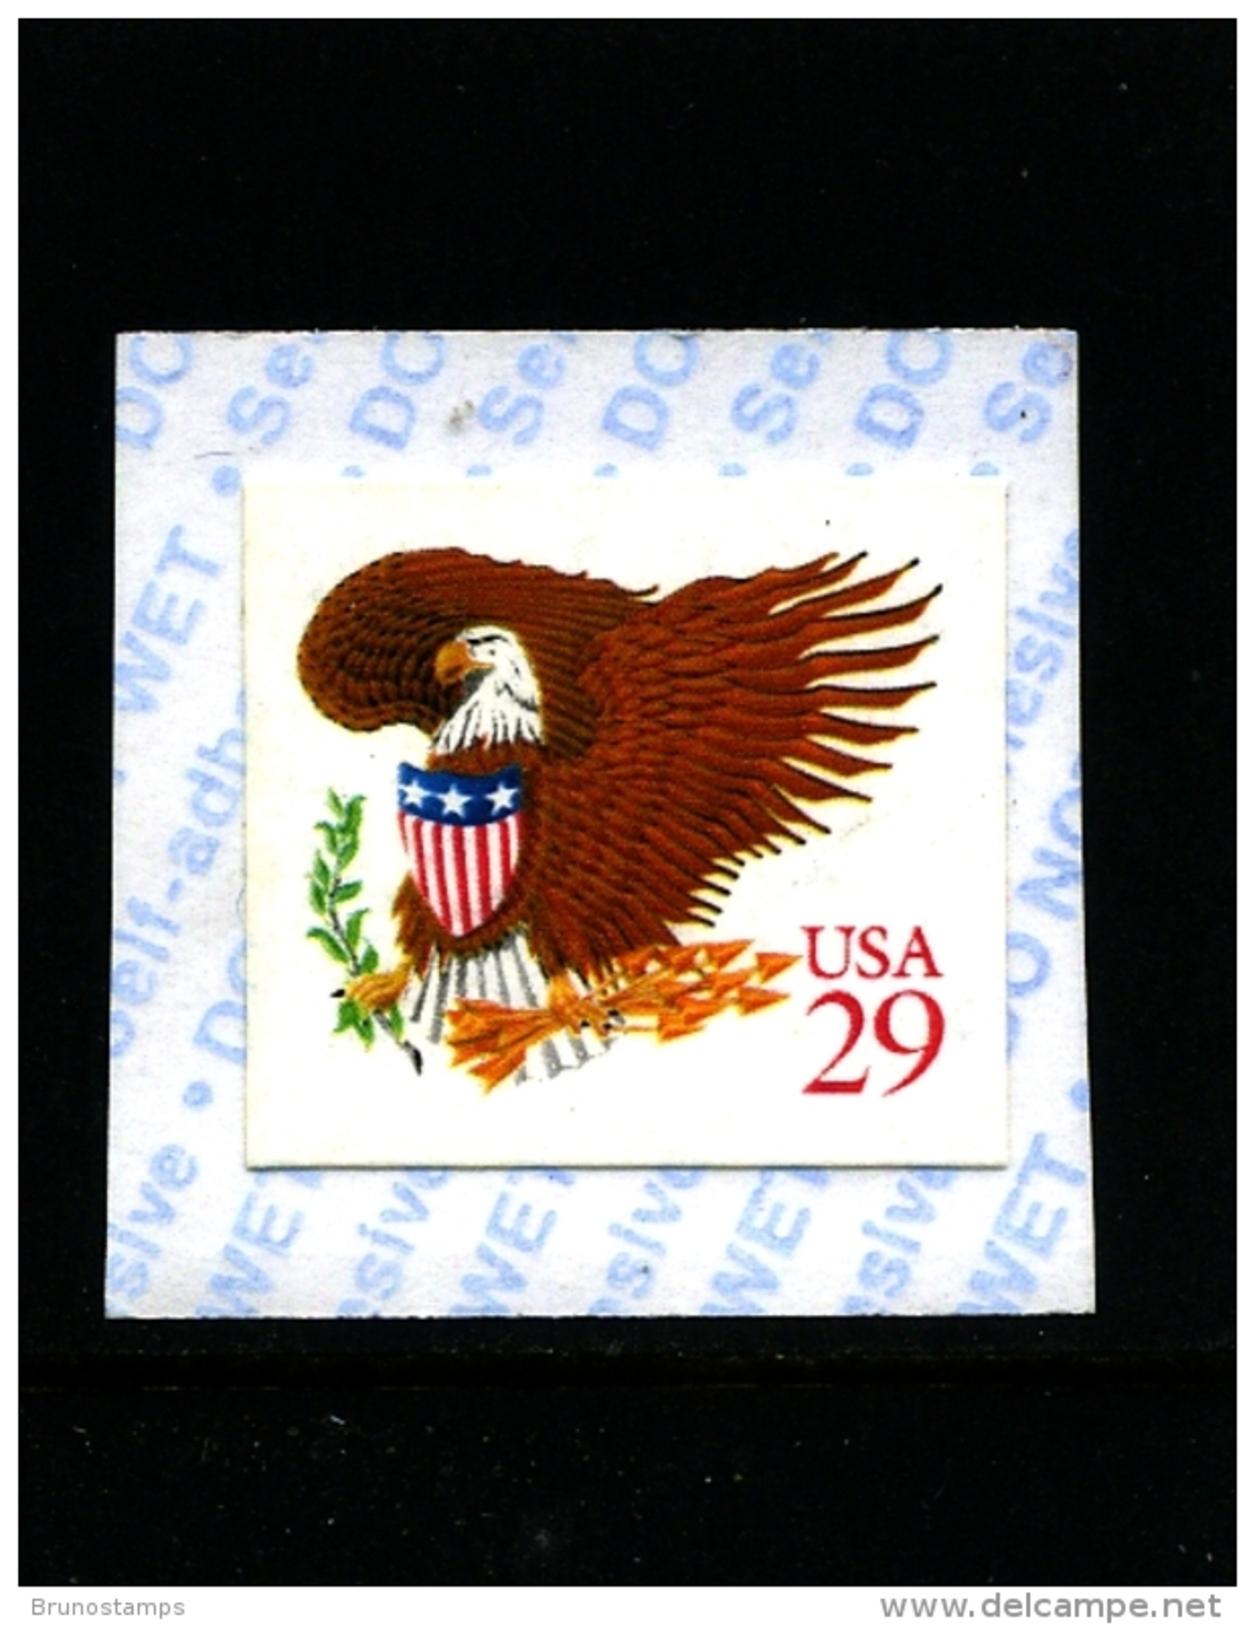 UNITED STATES/USA - 1992  29c  EAGLE  (RED)  SELF ADHESIVE MINT NH - Stati Uniti